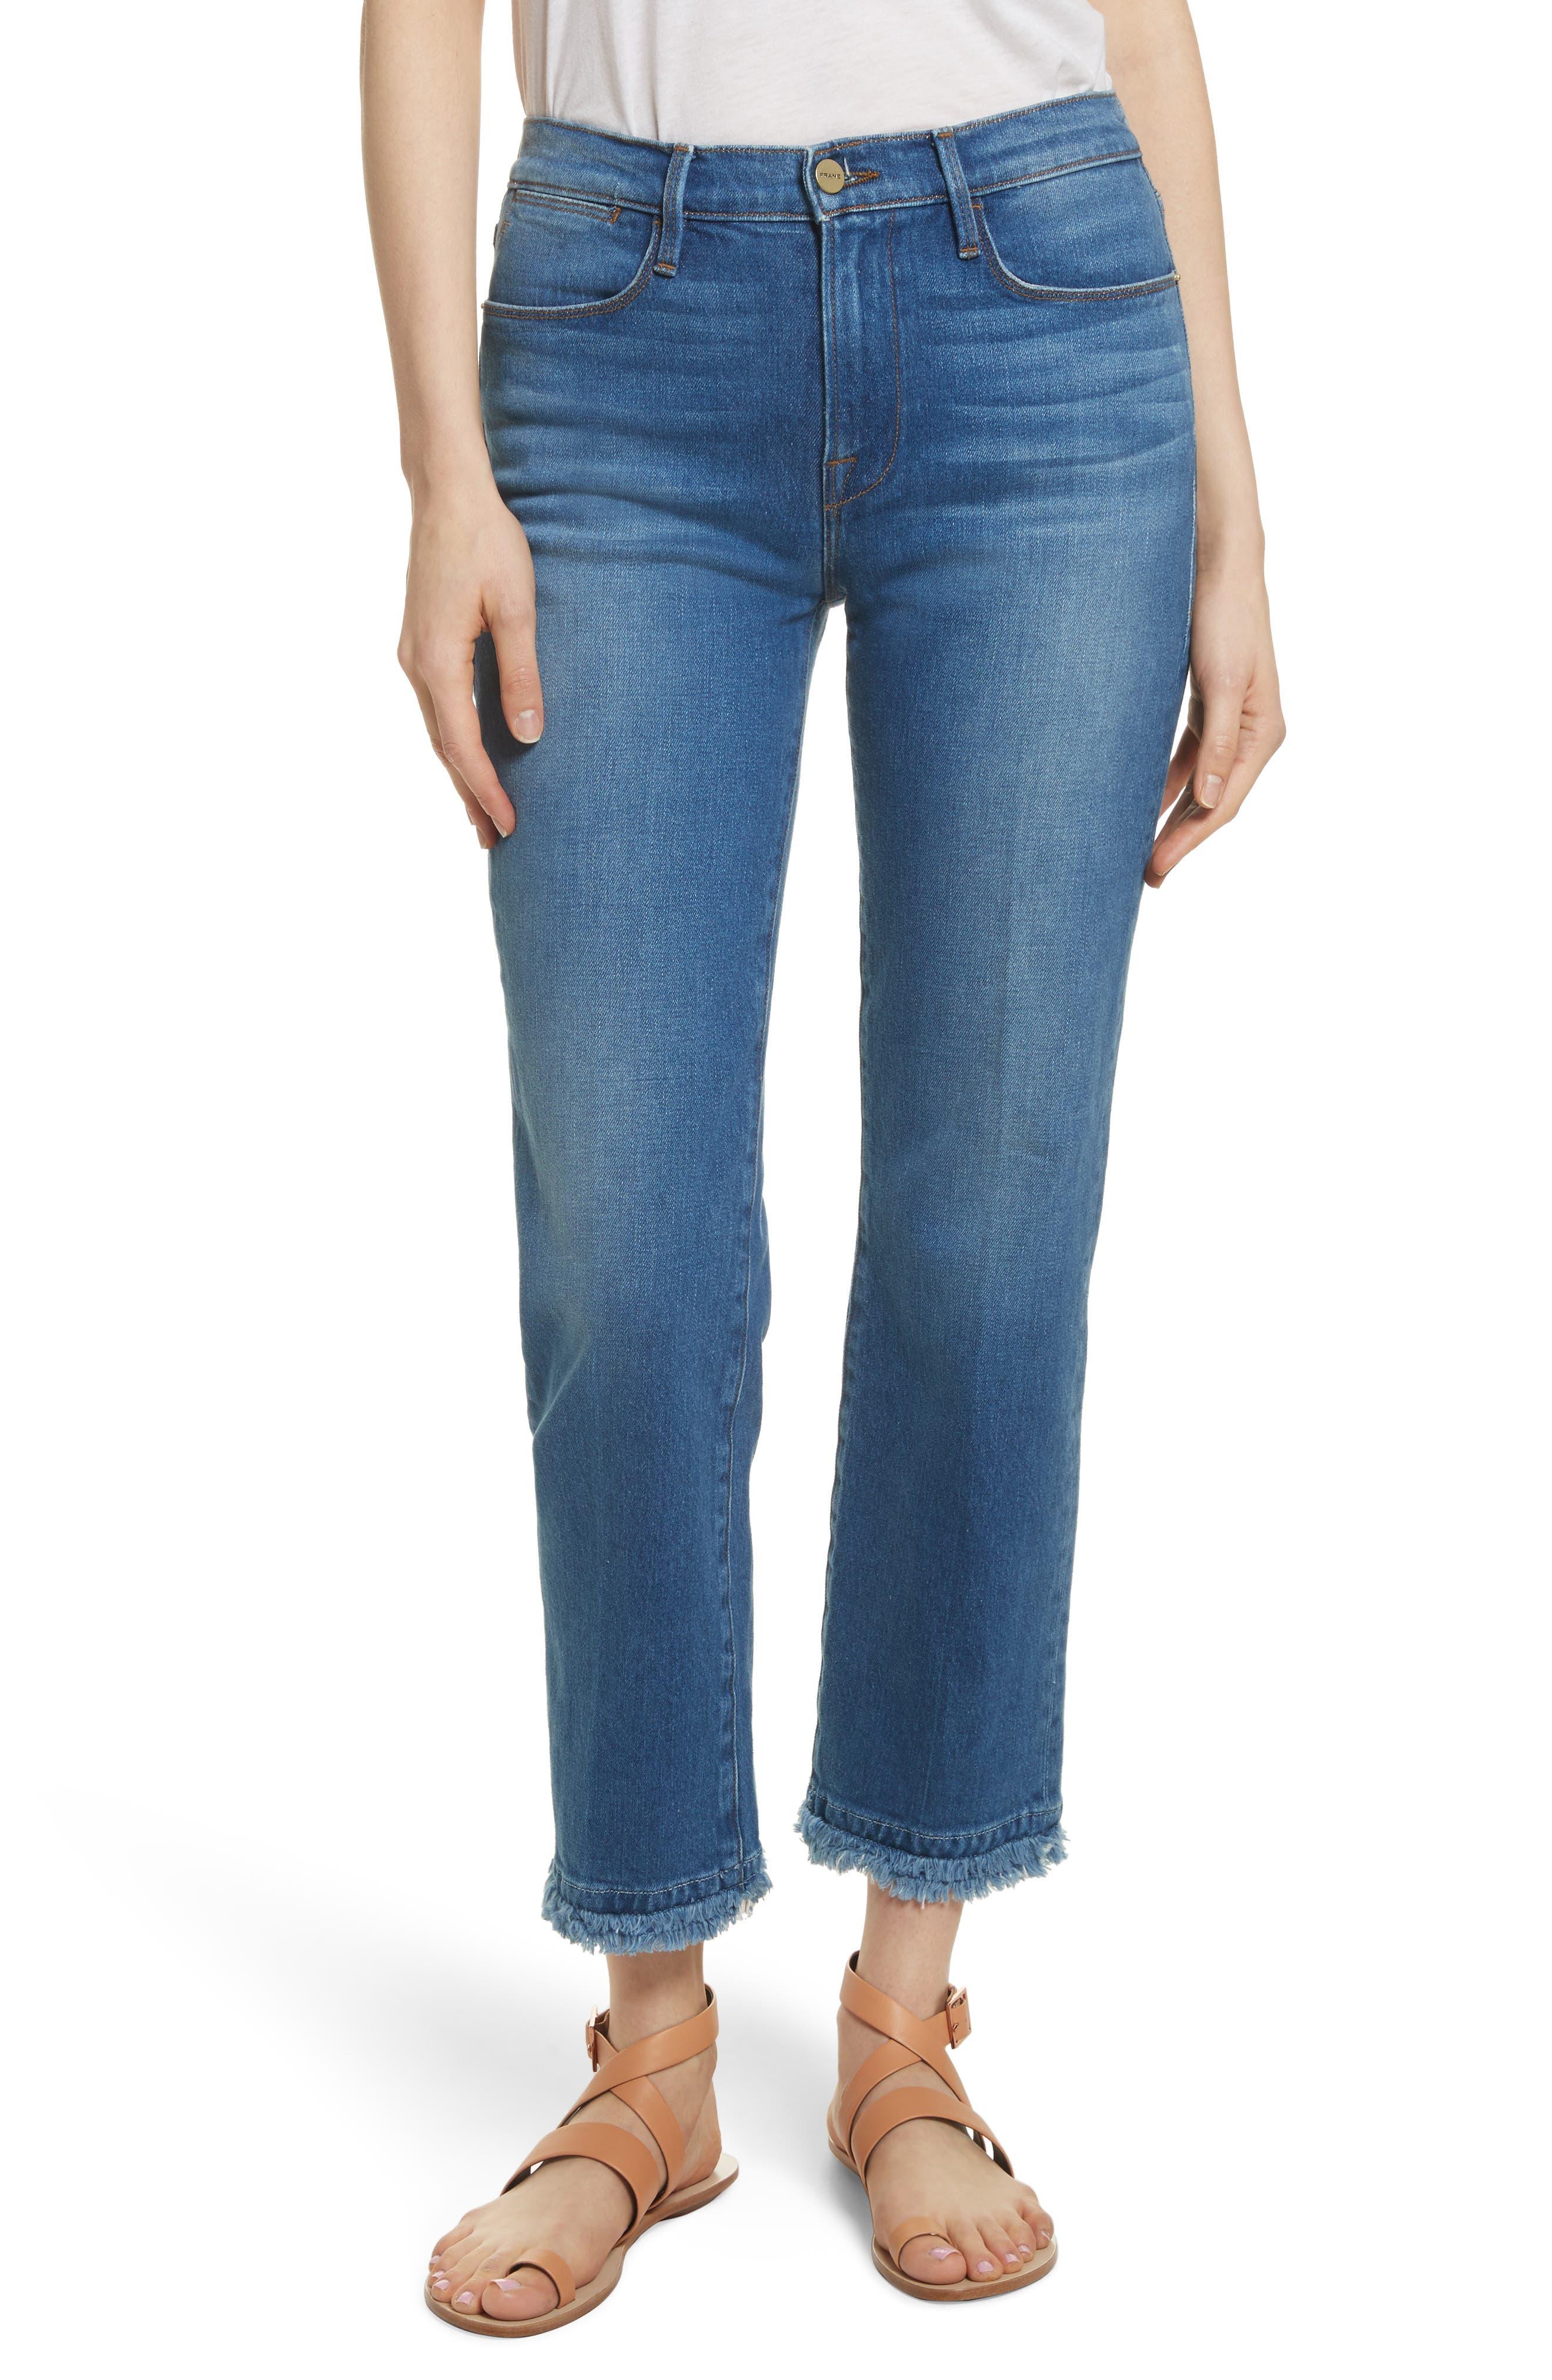 Le High Double Raw Edge High Waist Jeans,                             Main thumbnail 1, color,                             Whitway